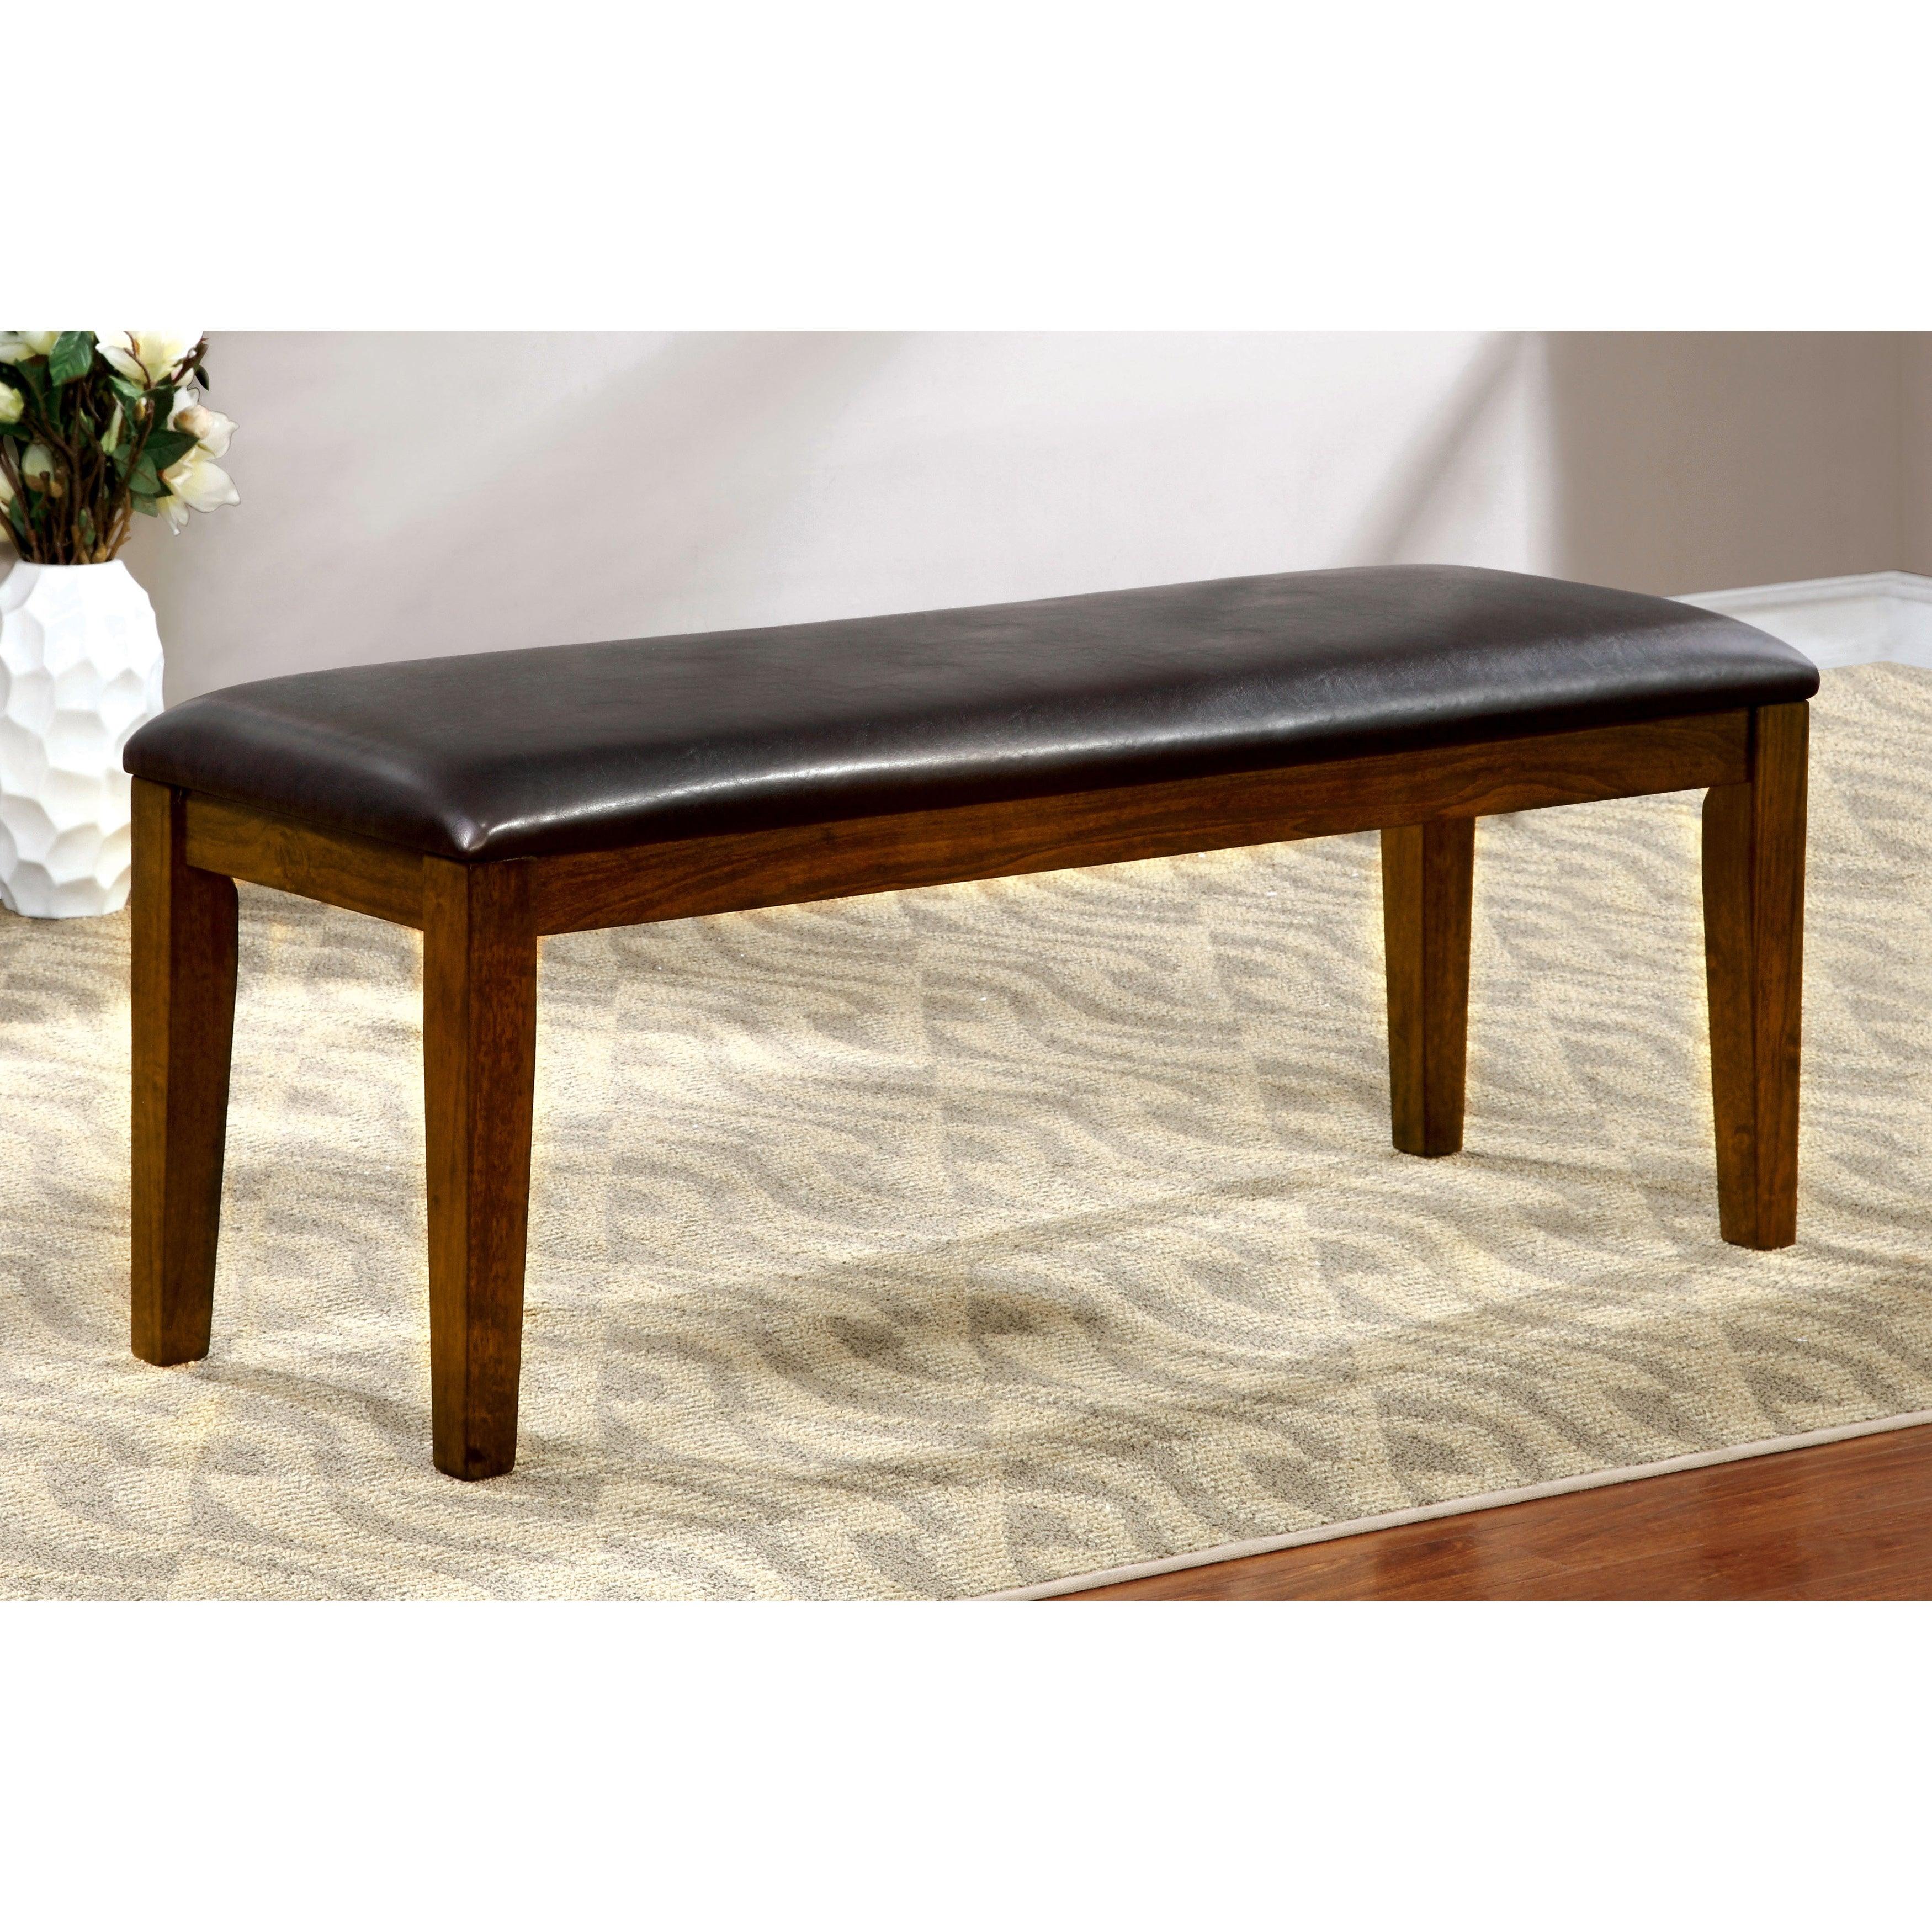 Furniture of America Leonard Leatherette Brown Cherry Din...